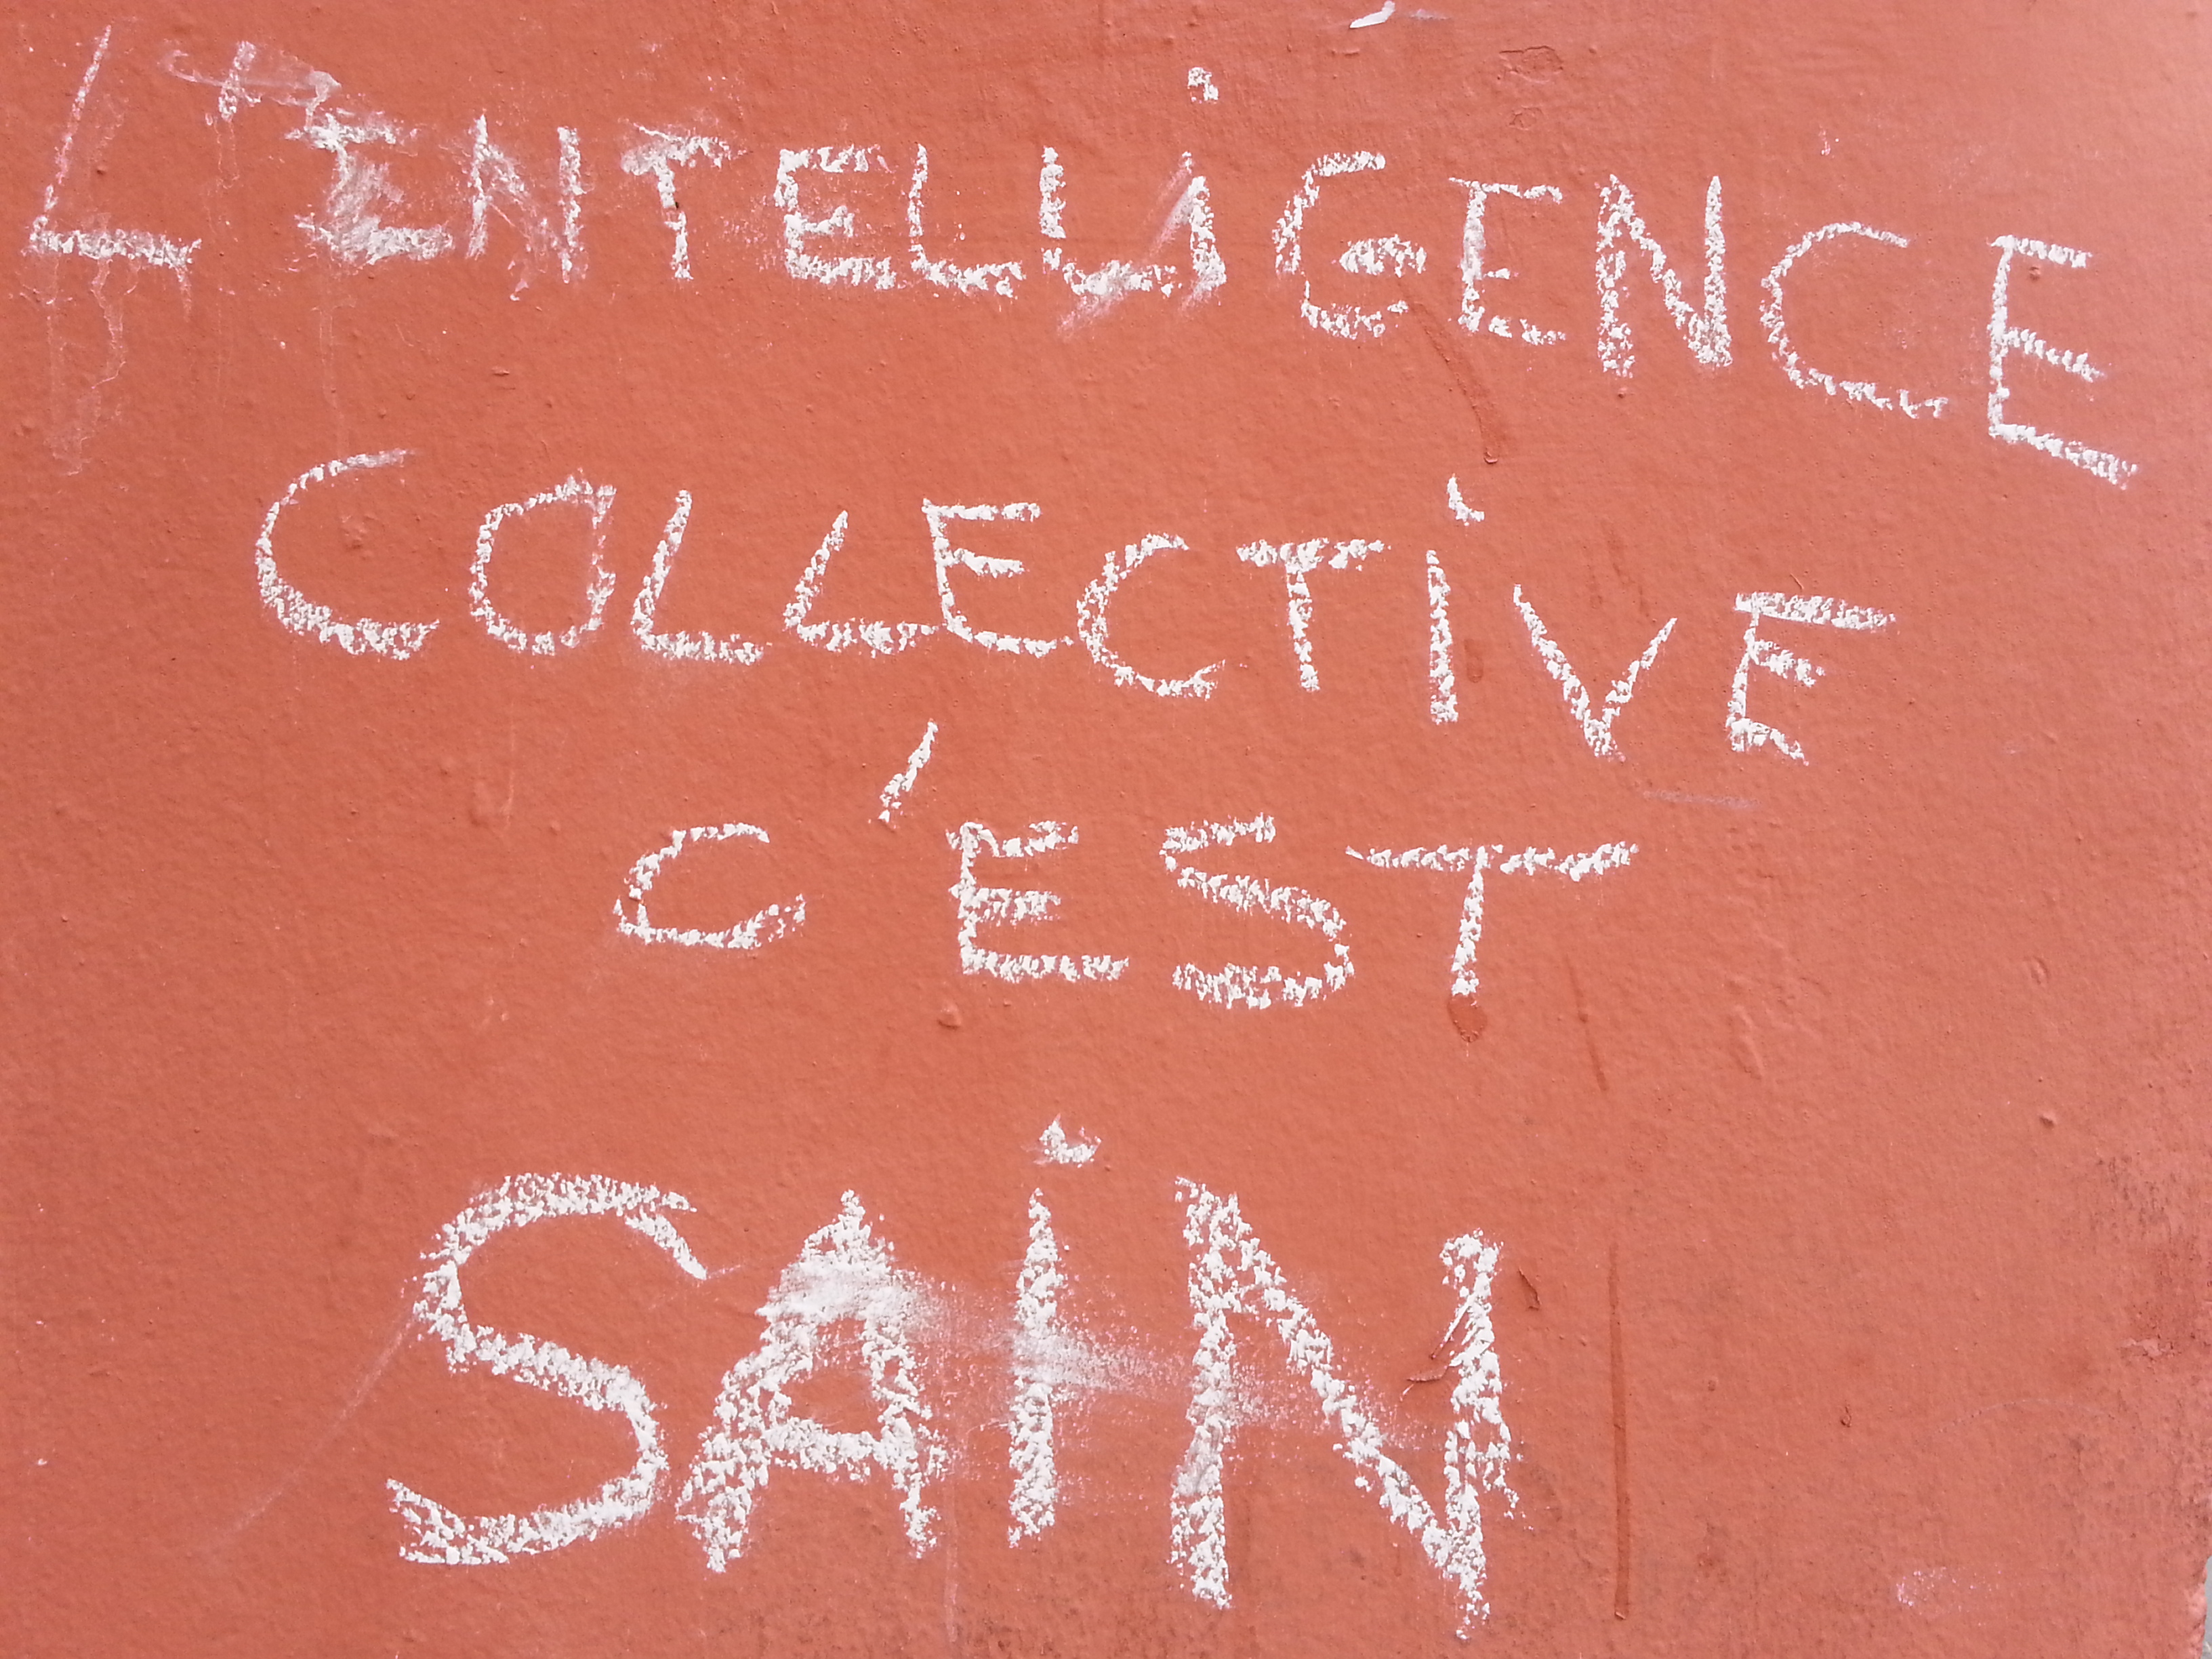 street art pentes croix rousse lyon 5